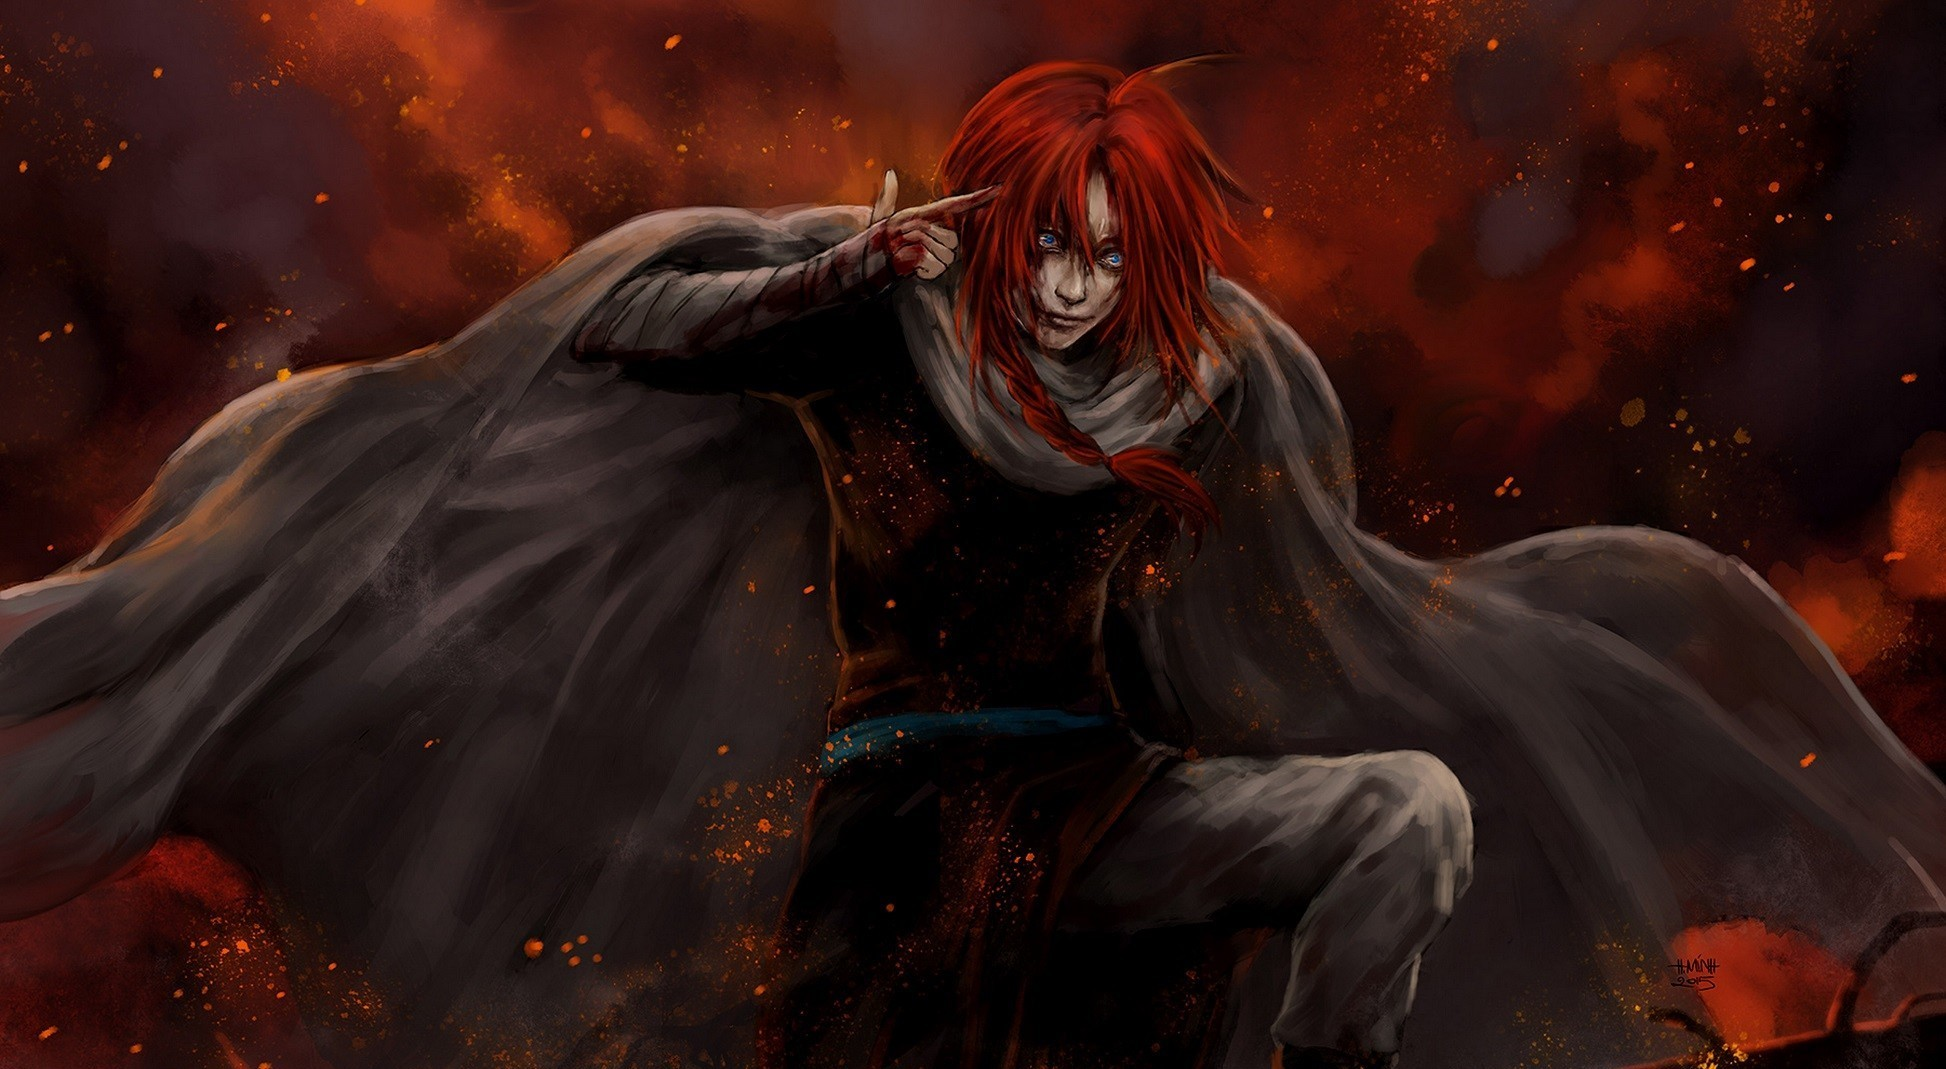 Kamui Fantasy Art Gintama Artwork